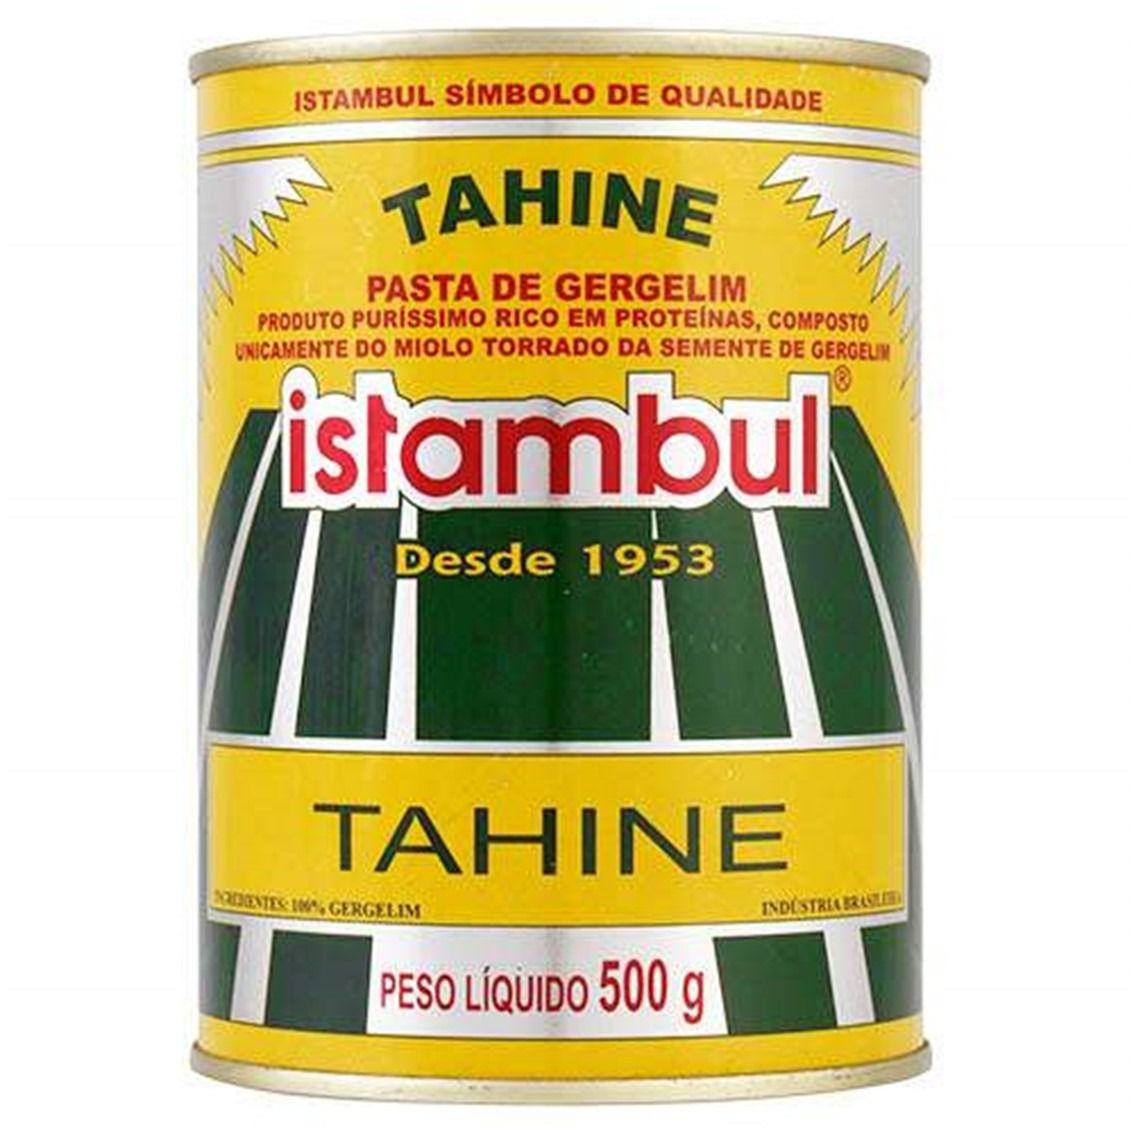 TAHINE ISTAMBUL CREME DE GERGELIM  LATA 500G